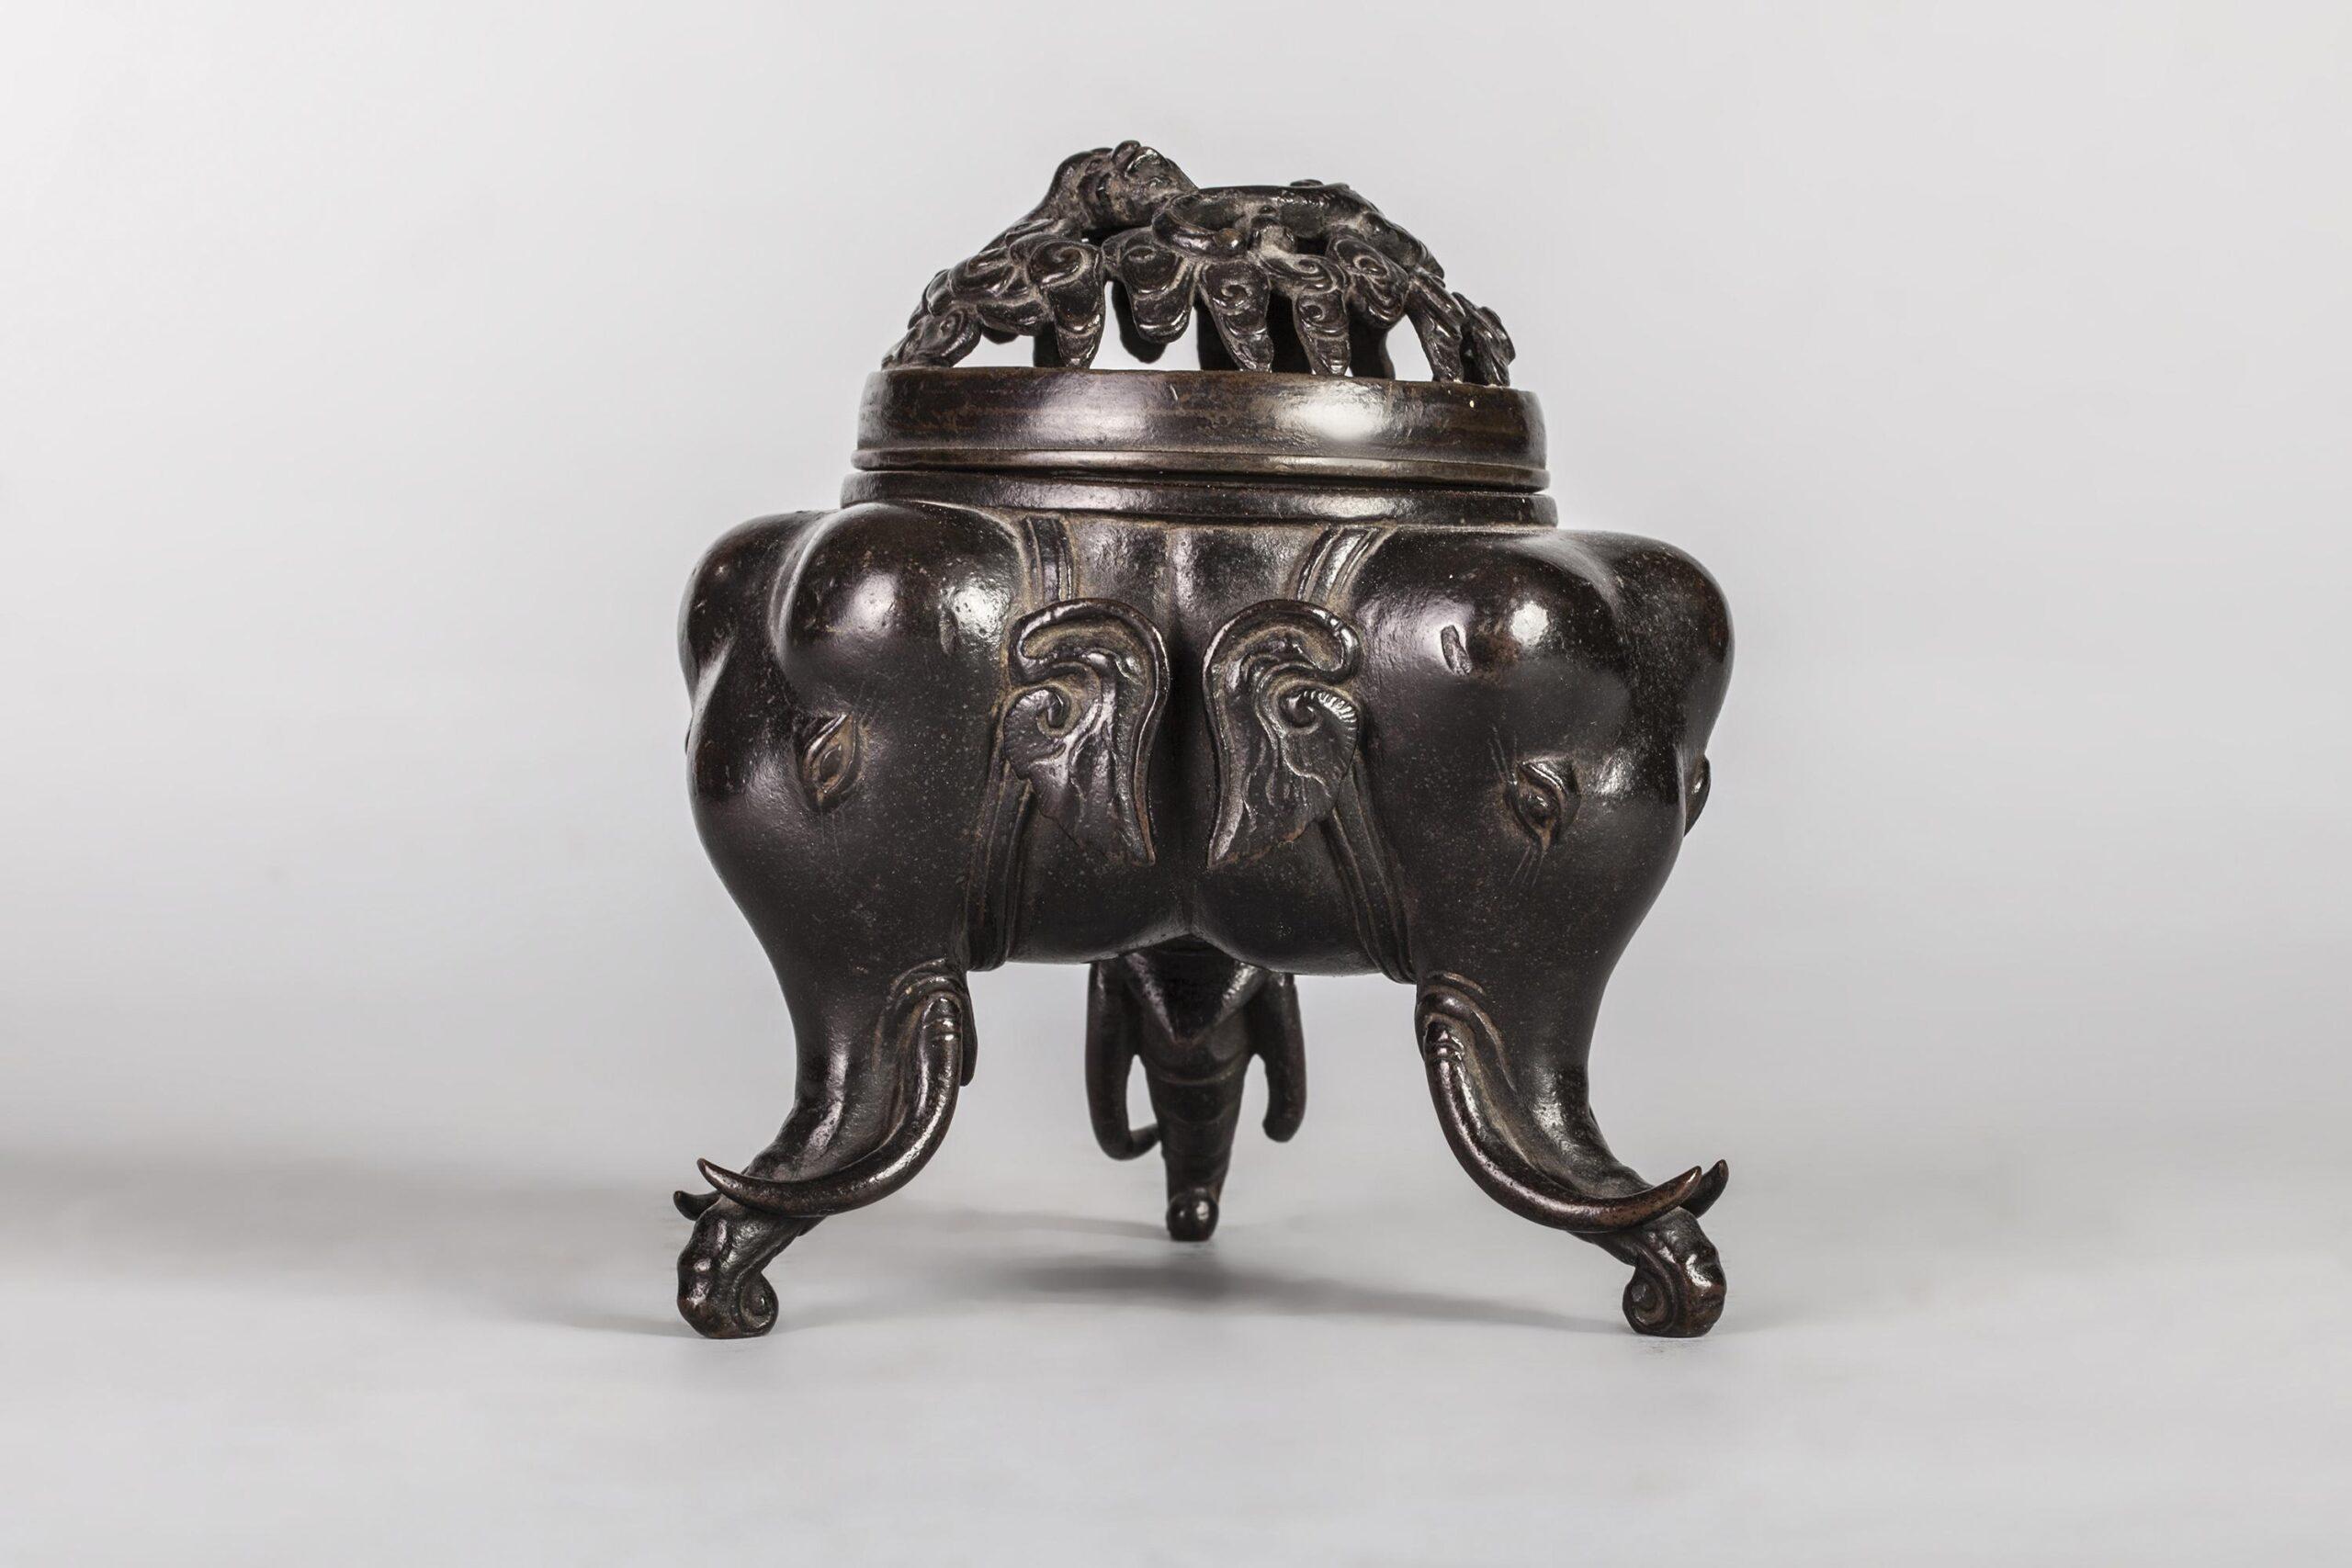 Bronze Tripod Incense Burner China, late Ming Dynasty, c. 1600 5 1/2 x 3 1/4 in (14 x 8.5 cm)